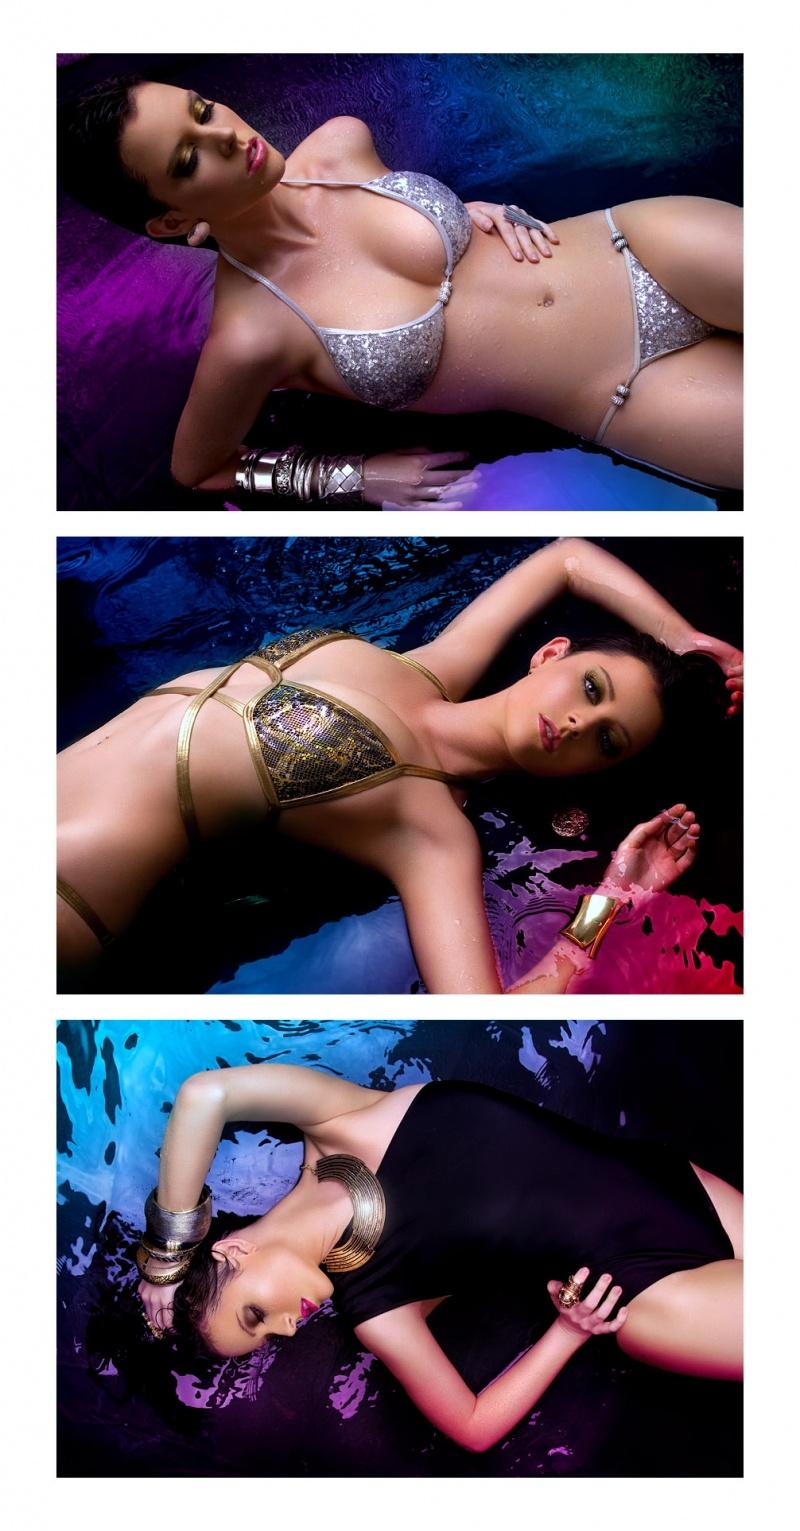 LiveImage Studios Dec 17, 2010 Nadia Masot Kelly in the swim! - Styling by Elisha Casagrande